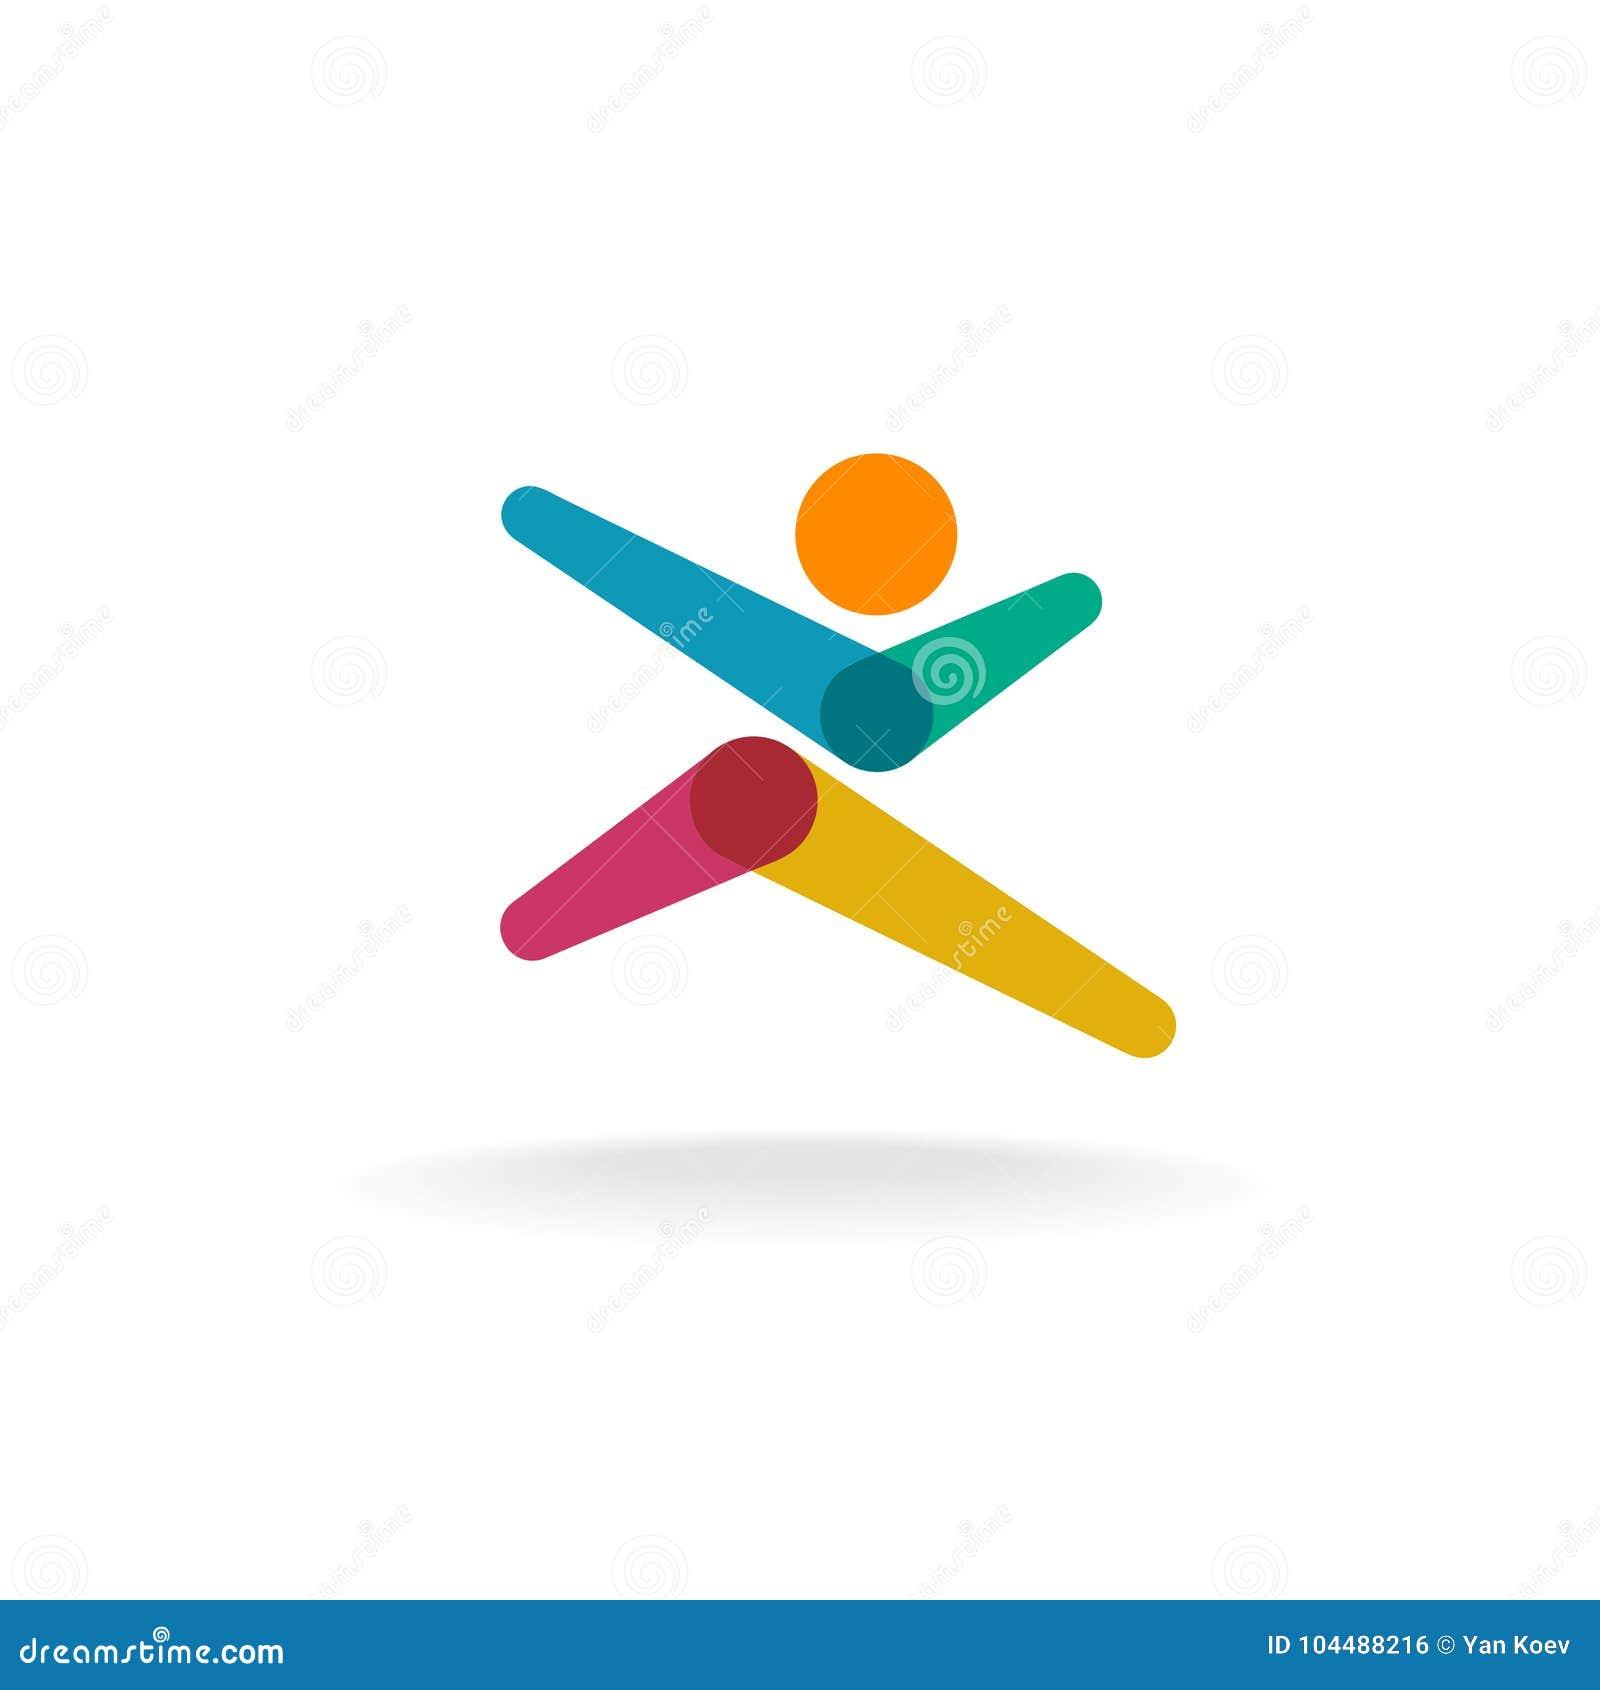 Running man colorful overlay logo.